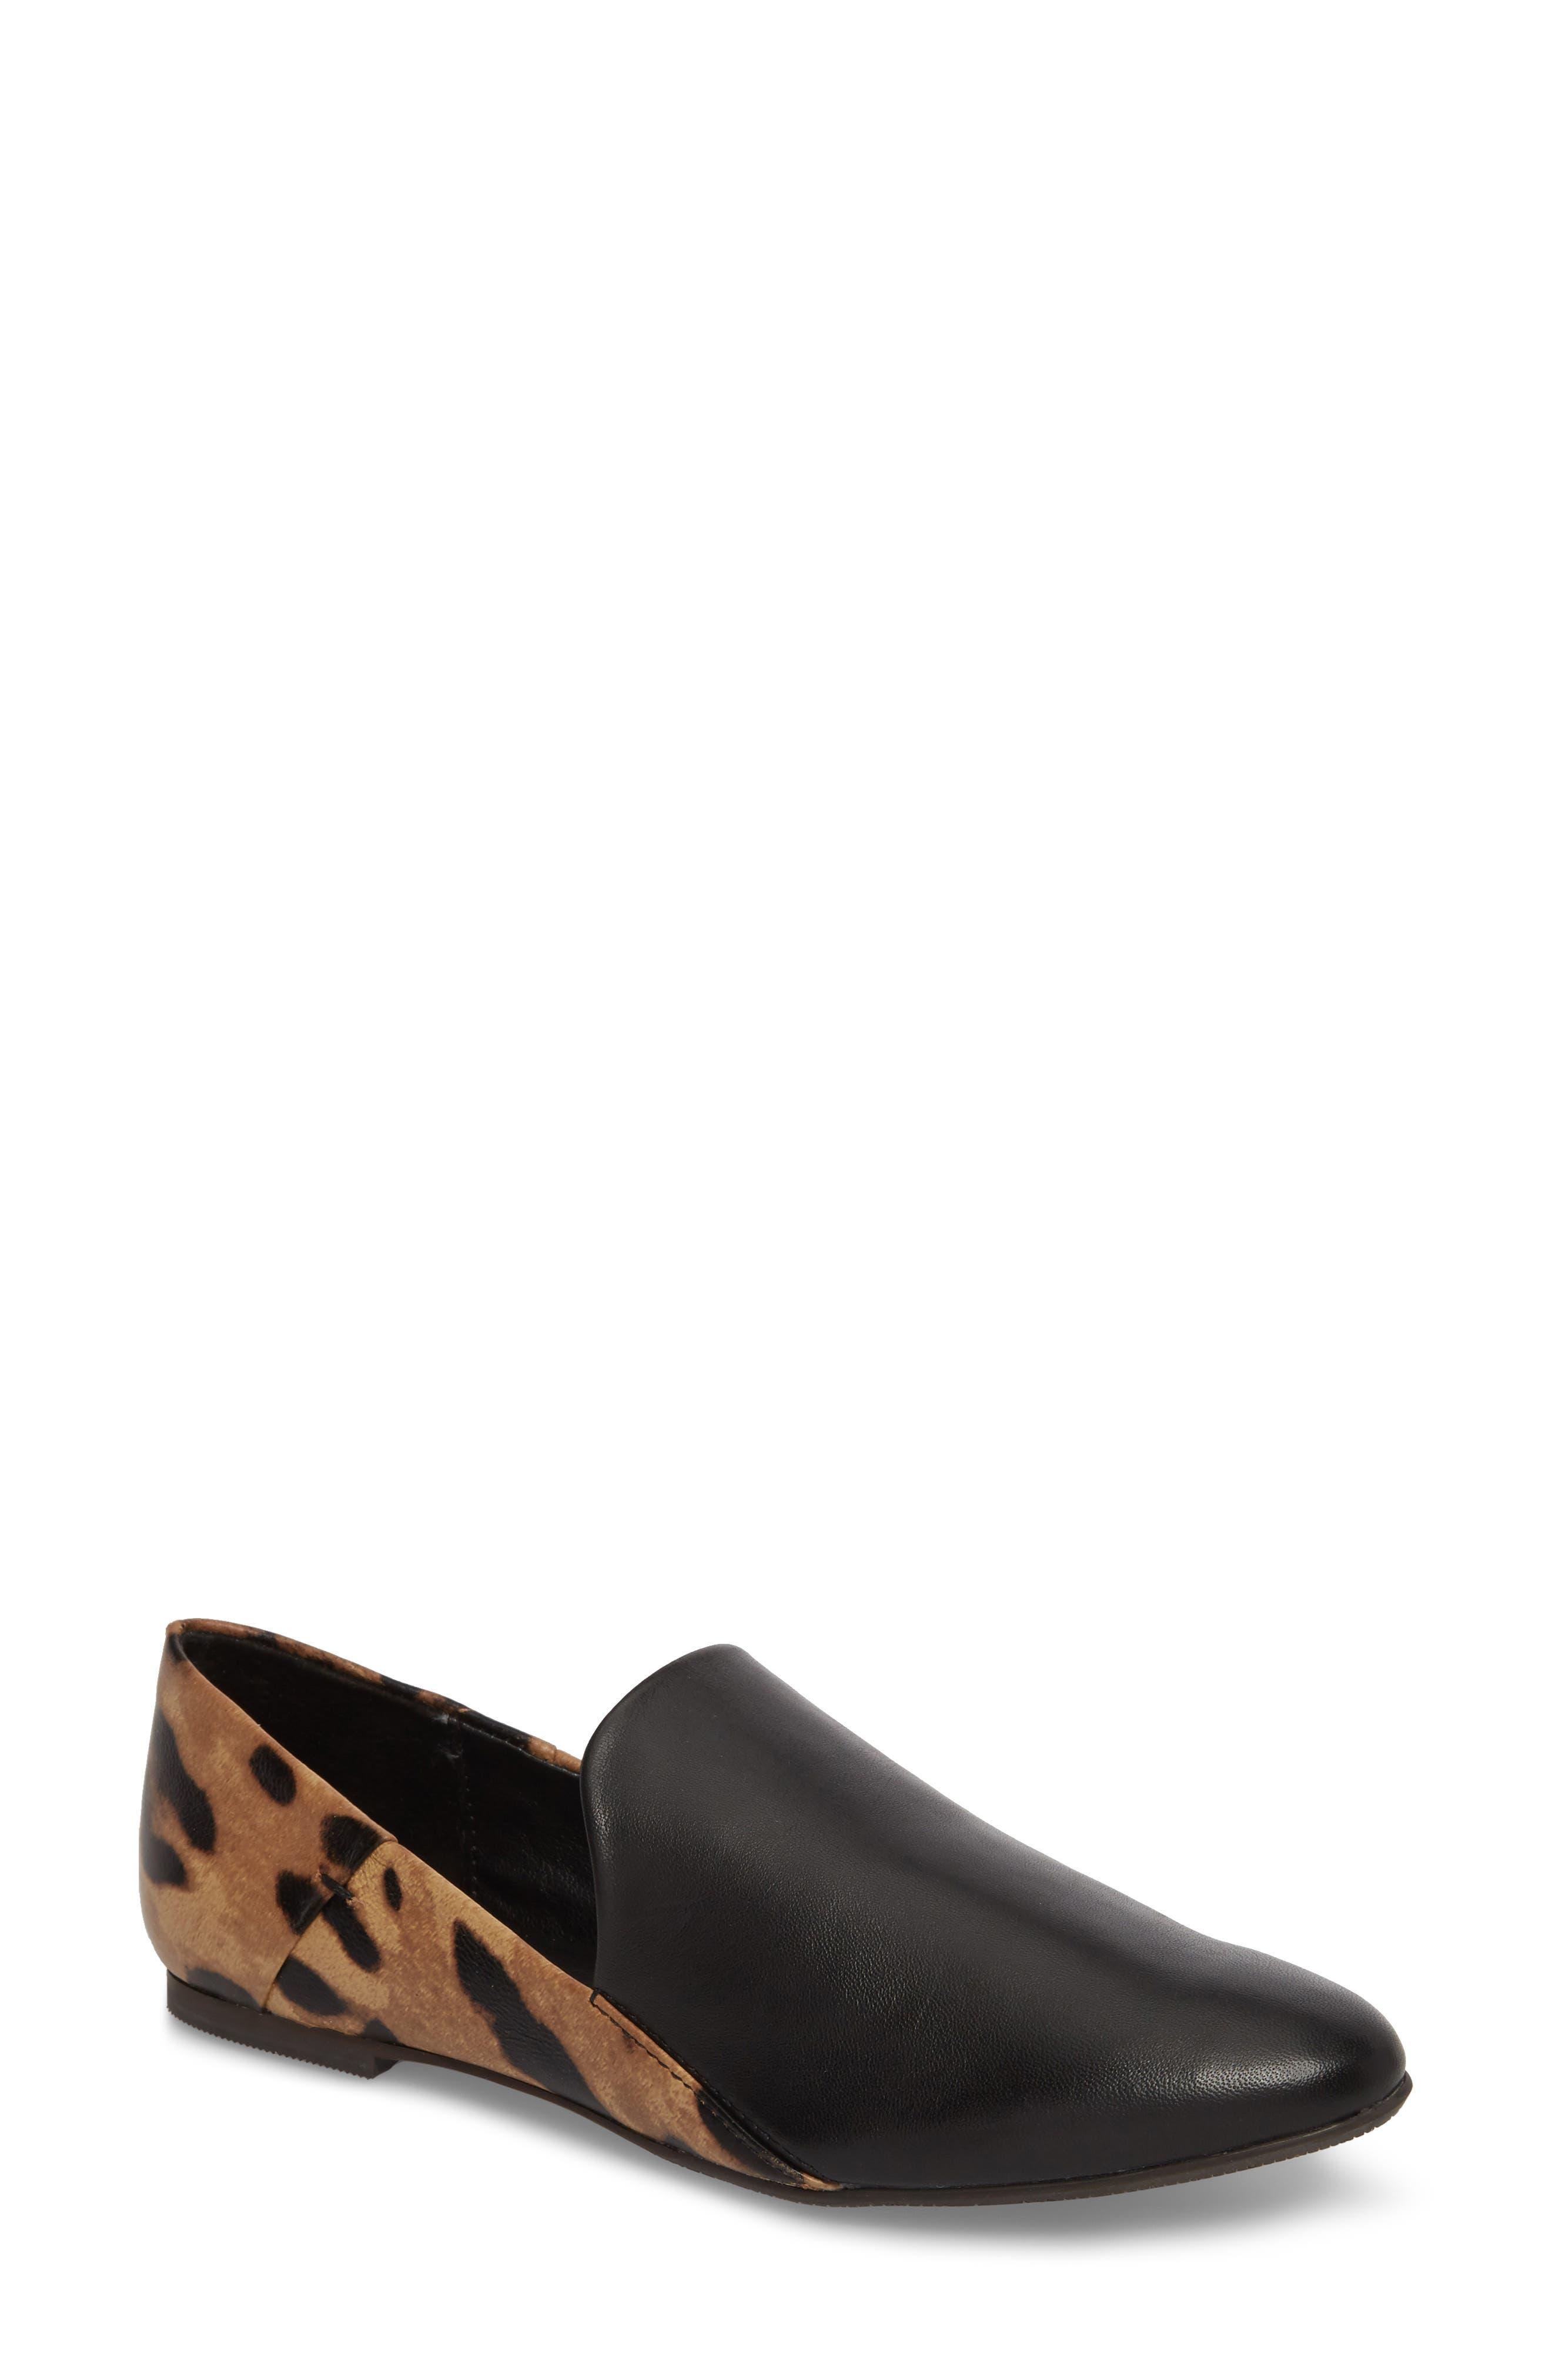 Gaga Flat,                             Main thumbnail 1, color,                             Black Leopard